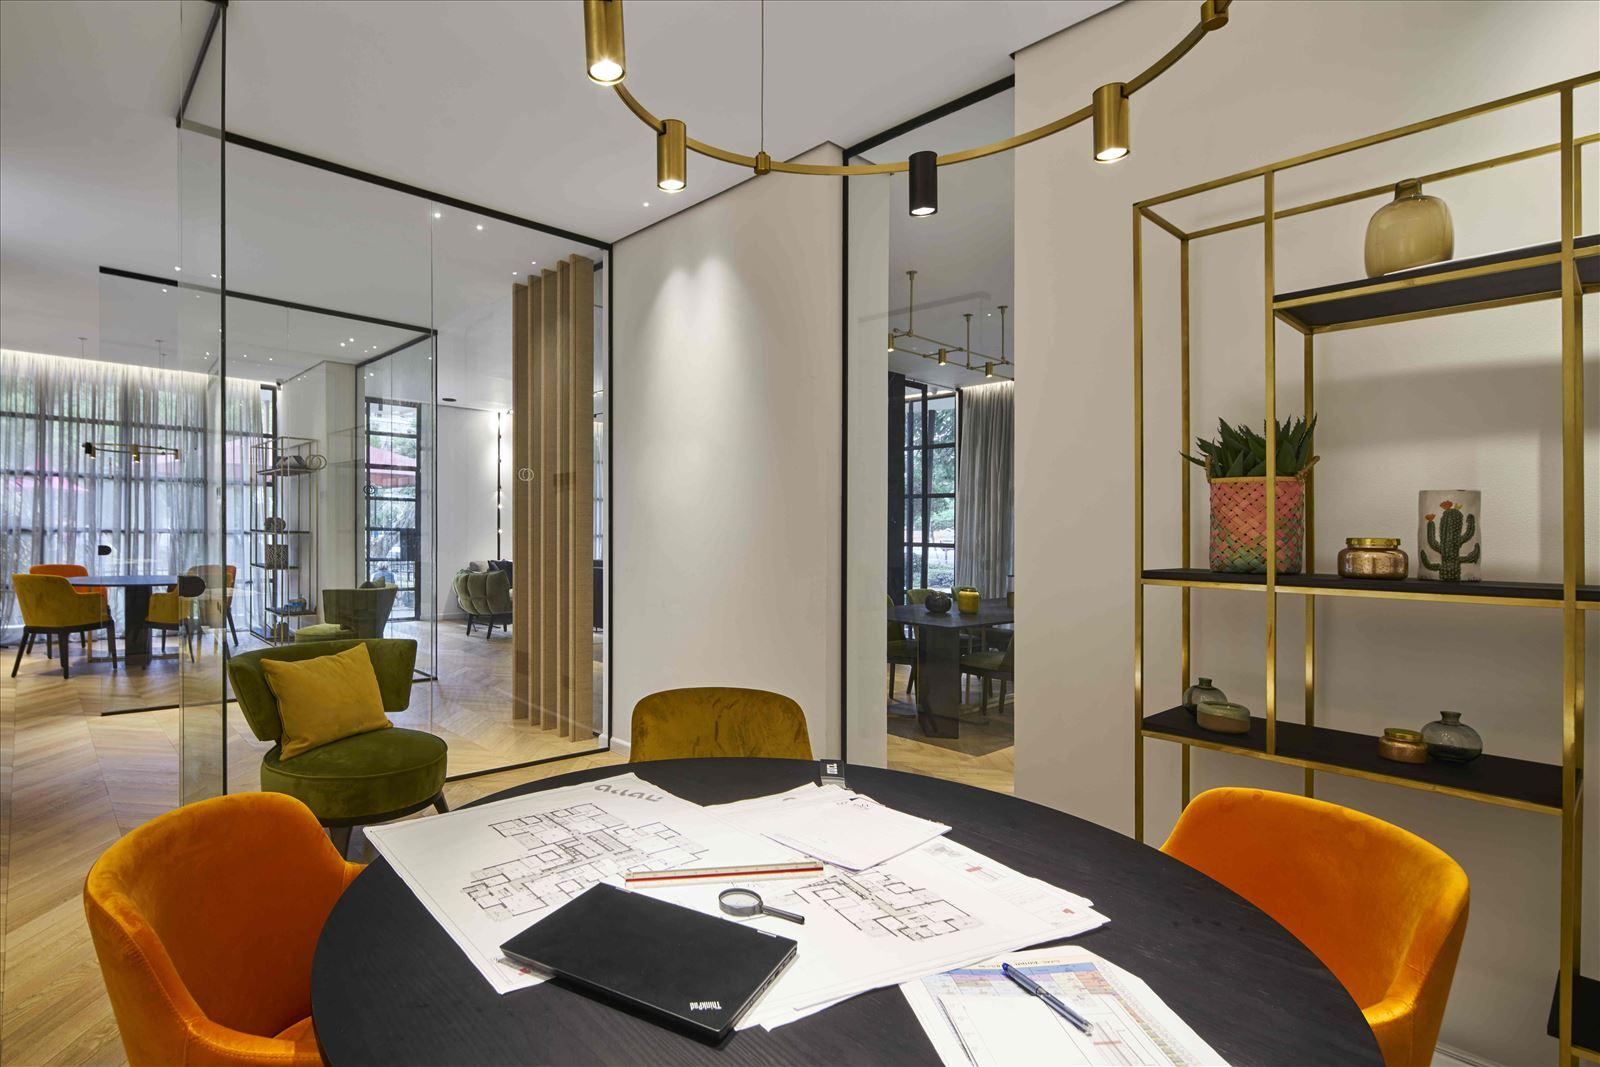 sales office - onone תאורת תקרה מעל שולחן עגול - קמחי תאורה